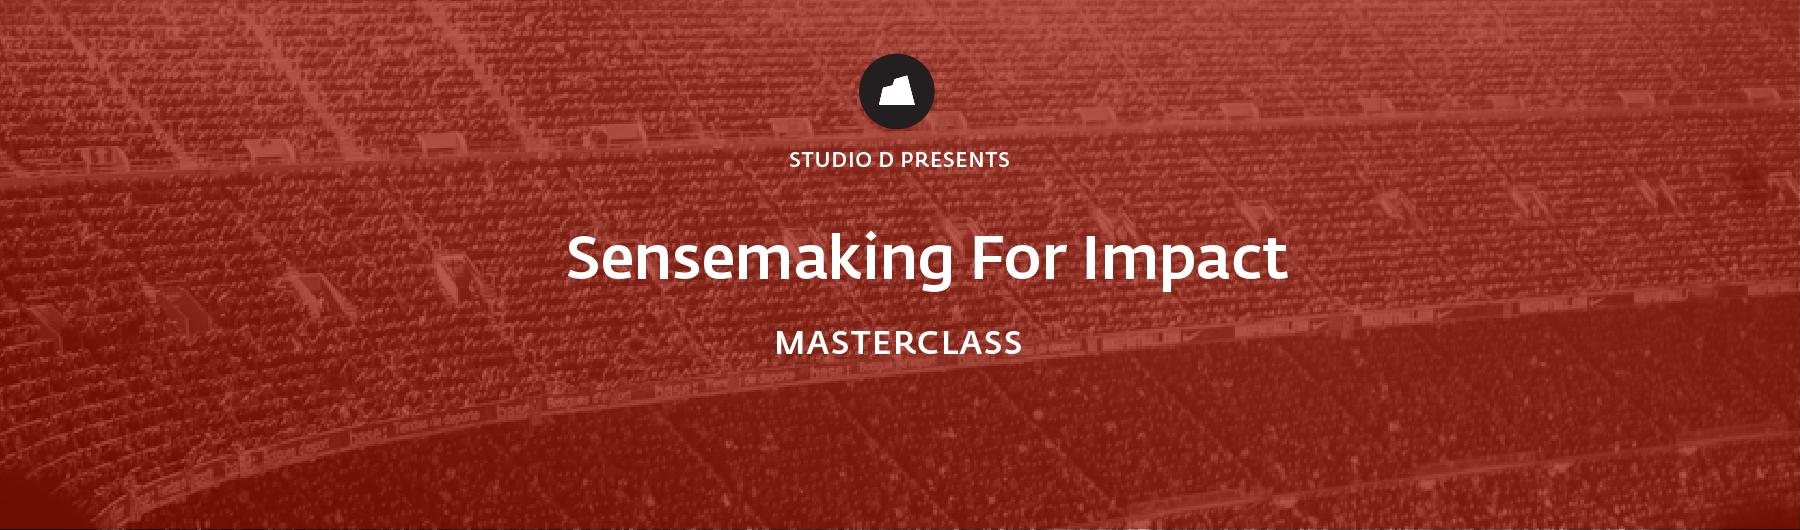 Sensemaking For Impact Masterclass, 17 April 2020, Bengaluru